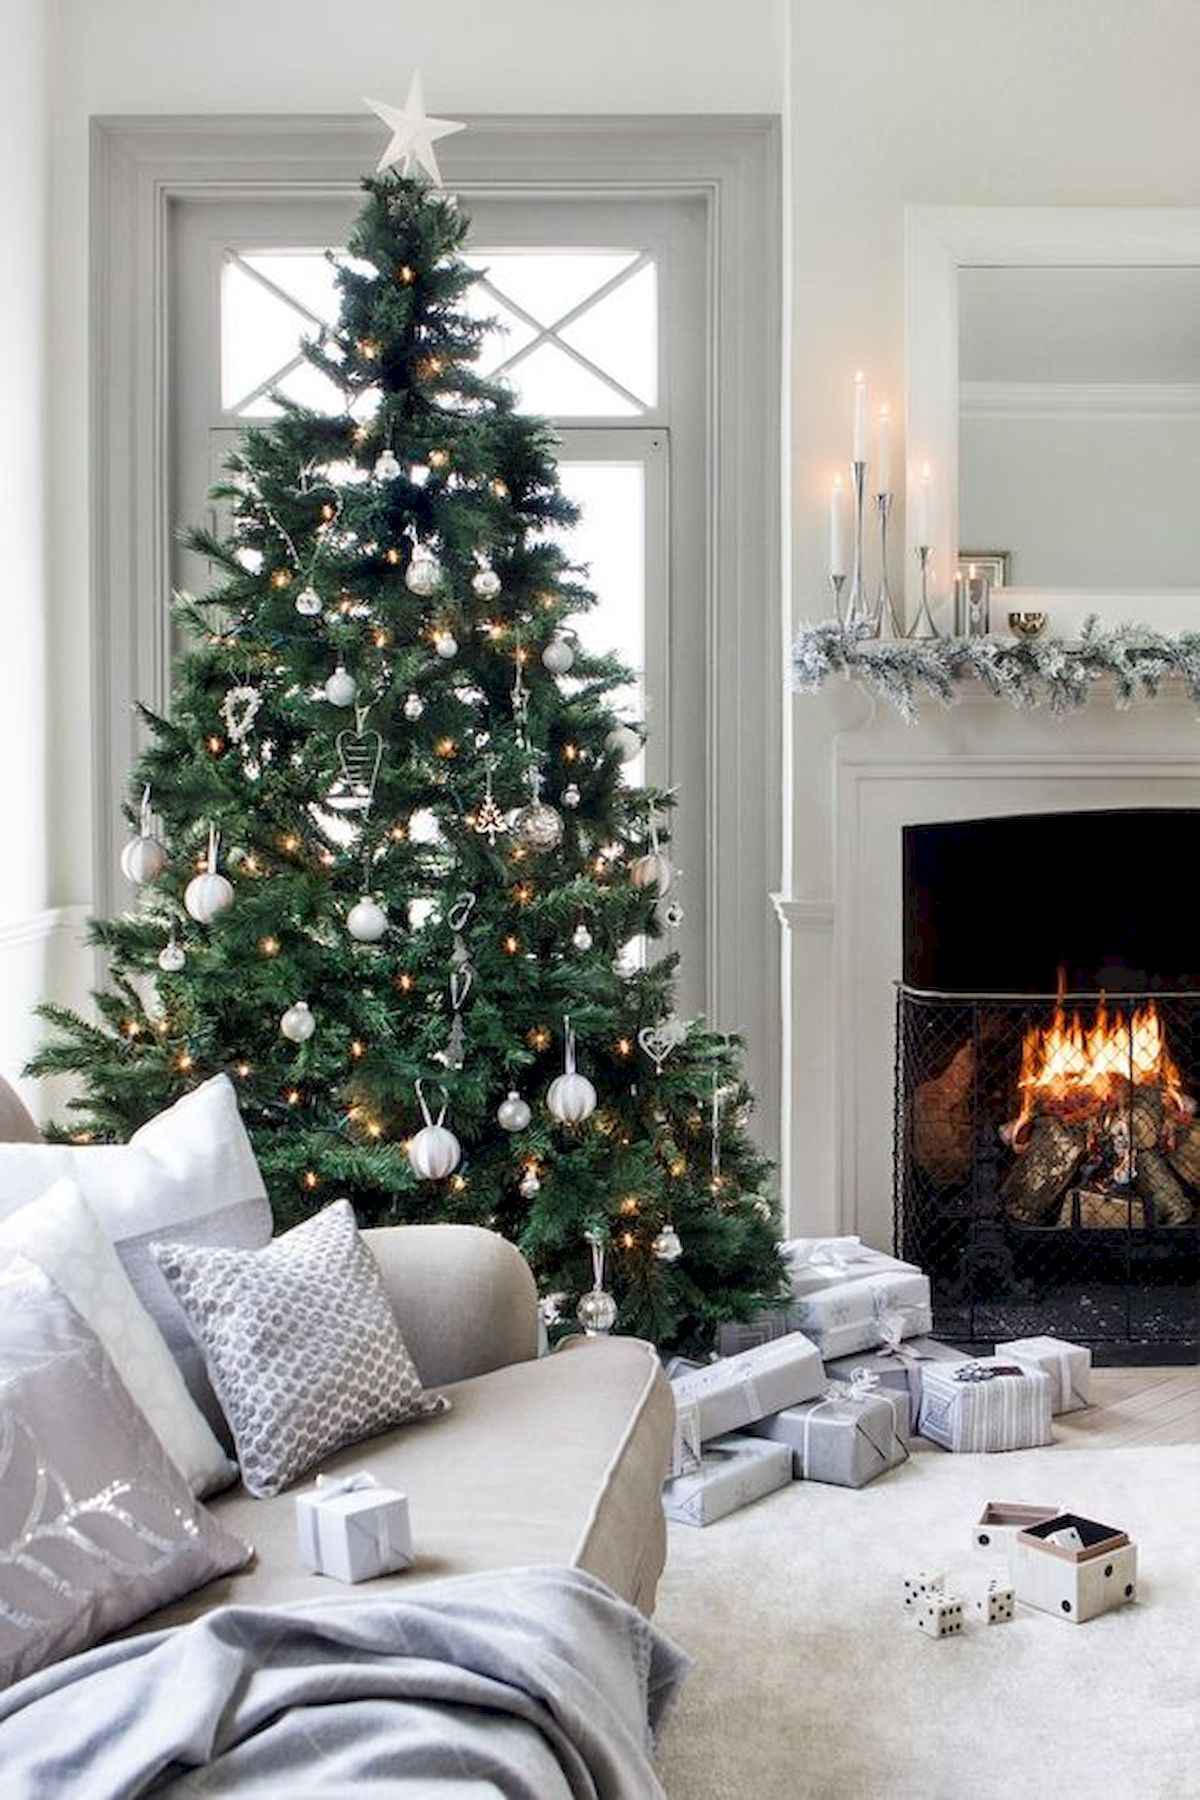 40 elegant christmas tree decorations ideas (30)